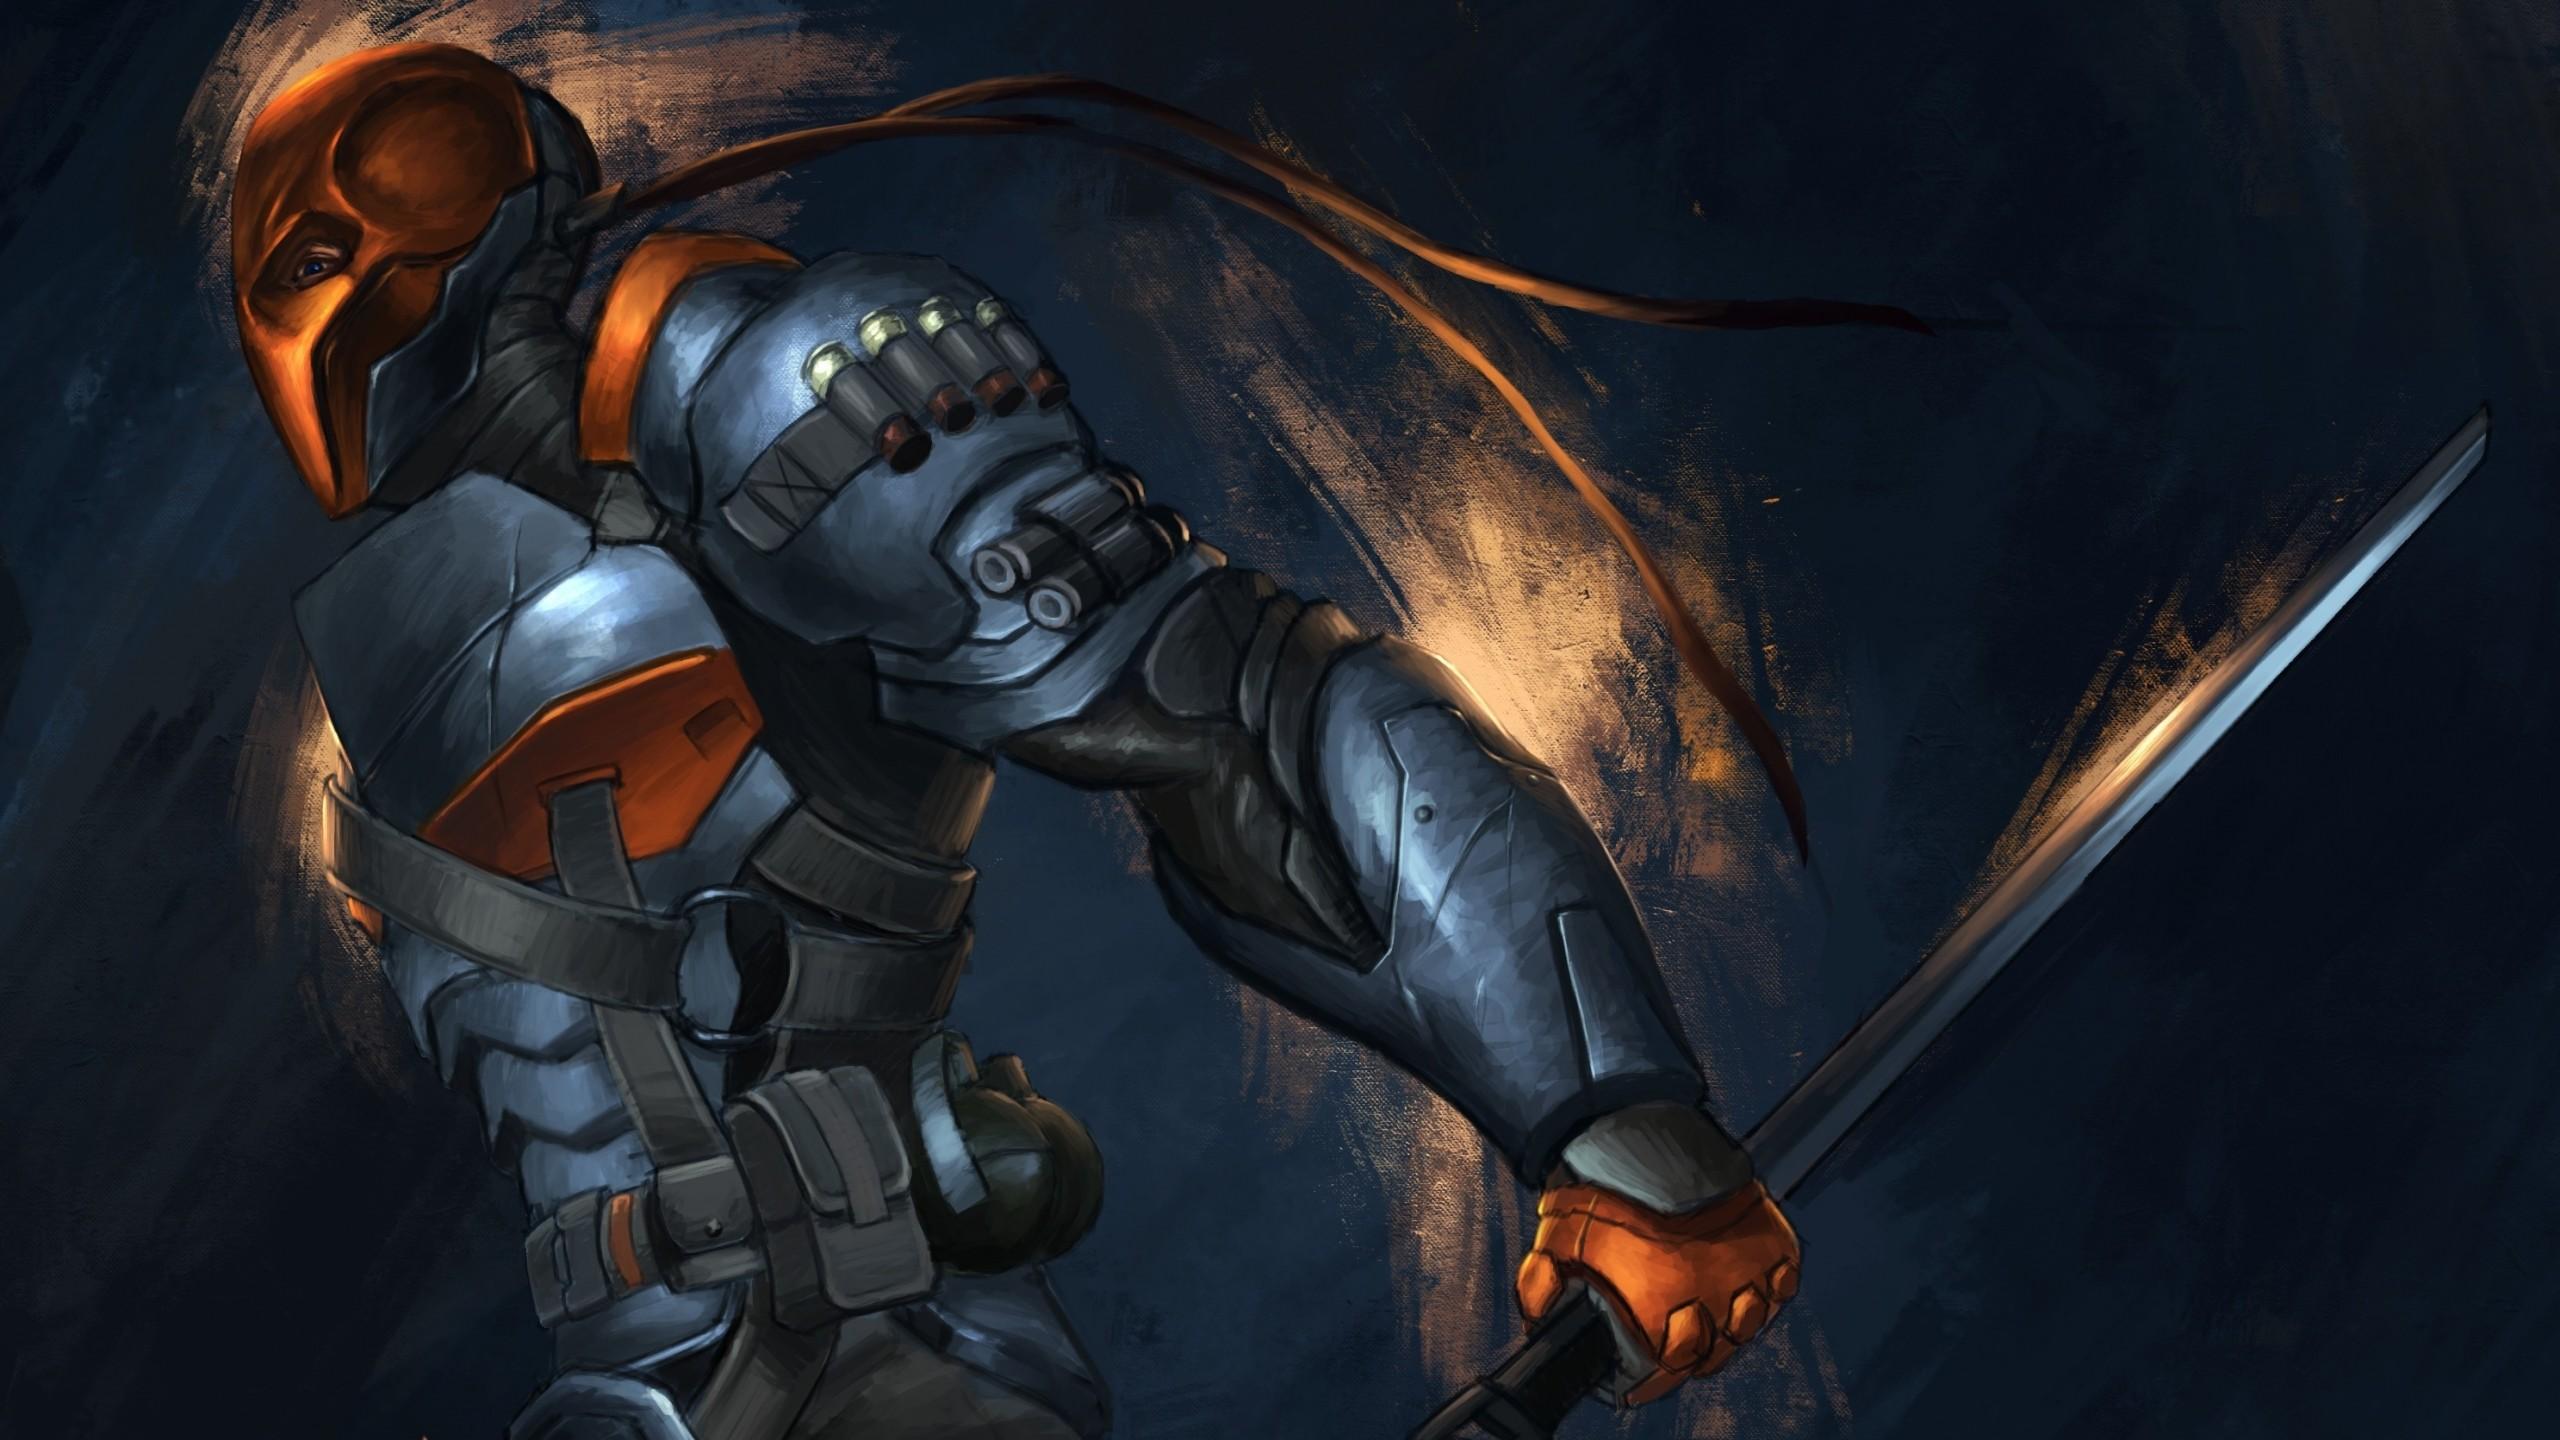 Wallpaper batman, arkham origins, deathstroke, sword, armor, art